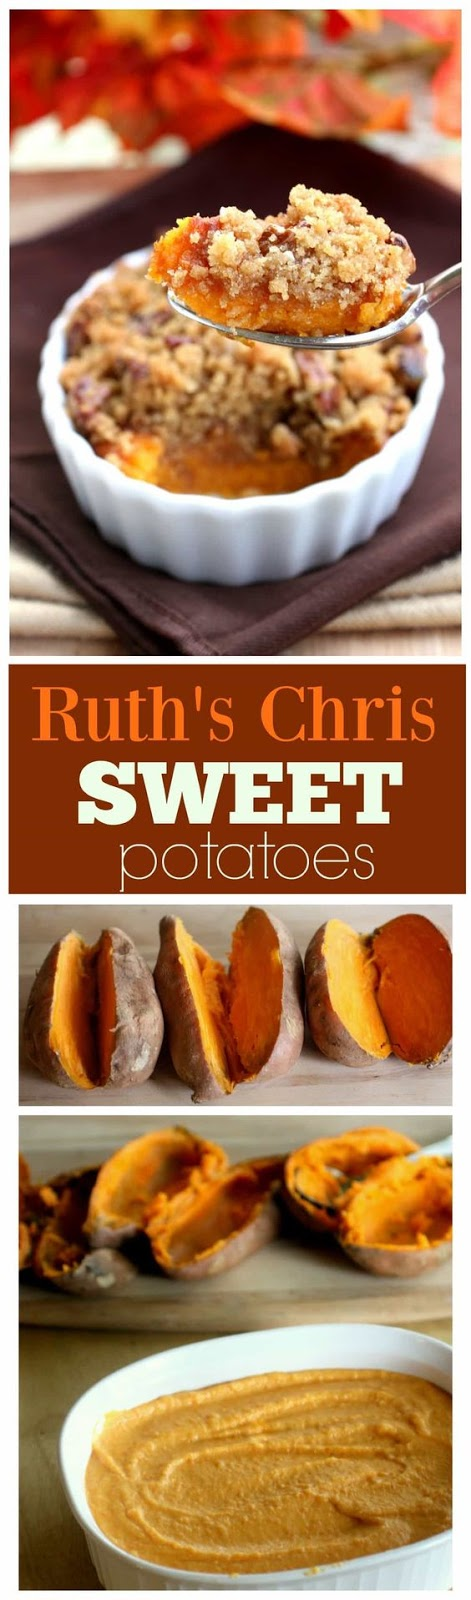 Sweet Potatoes – Ruth's Chris Style